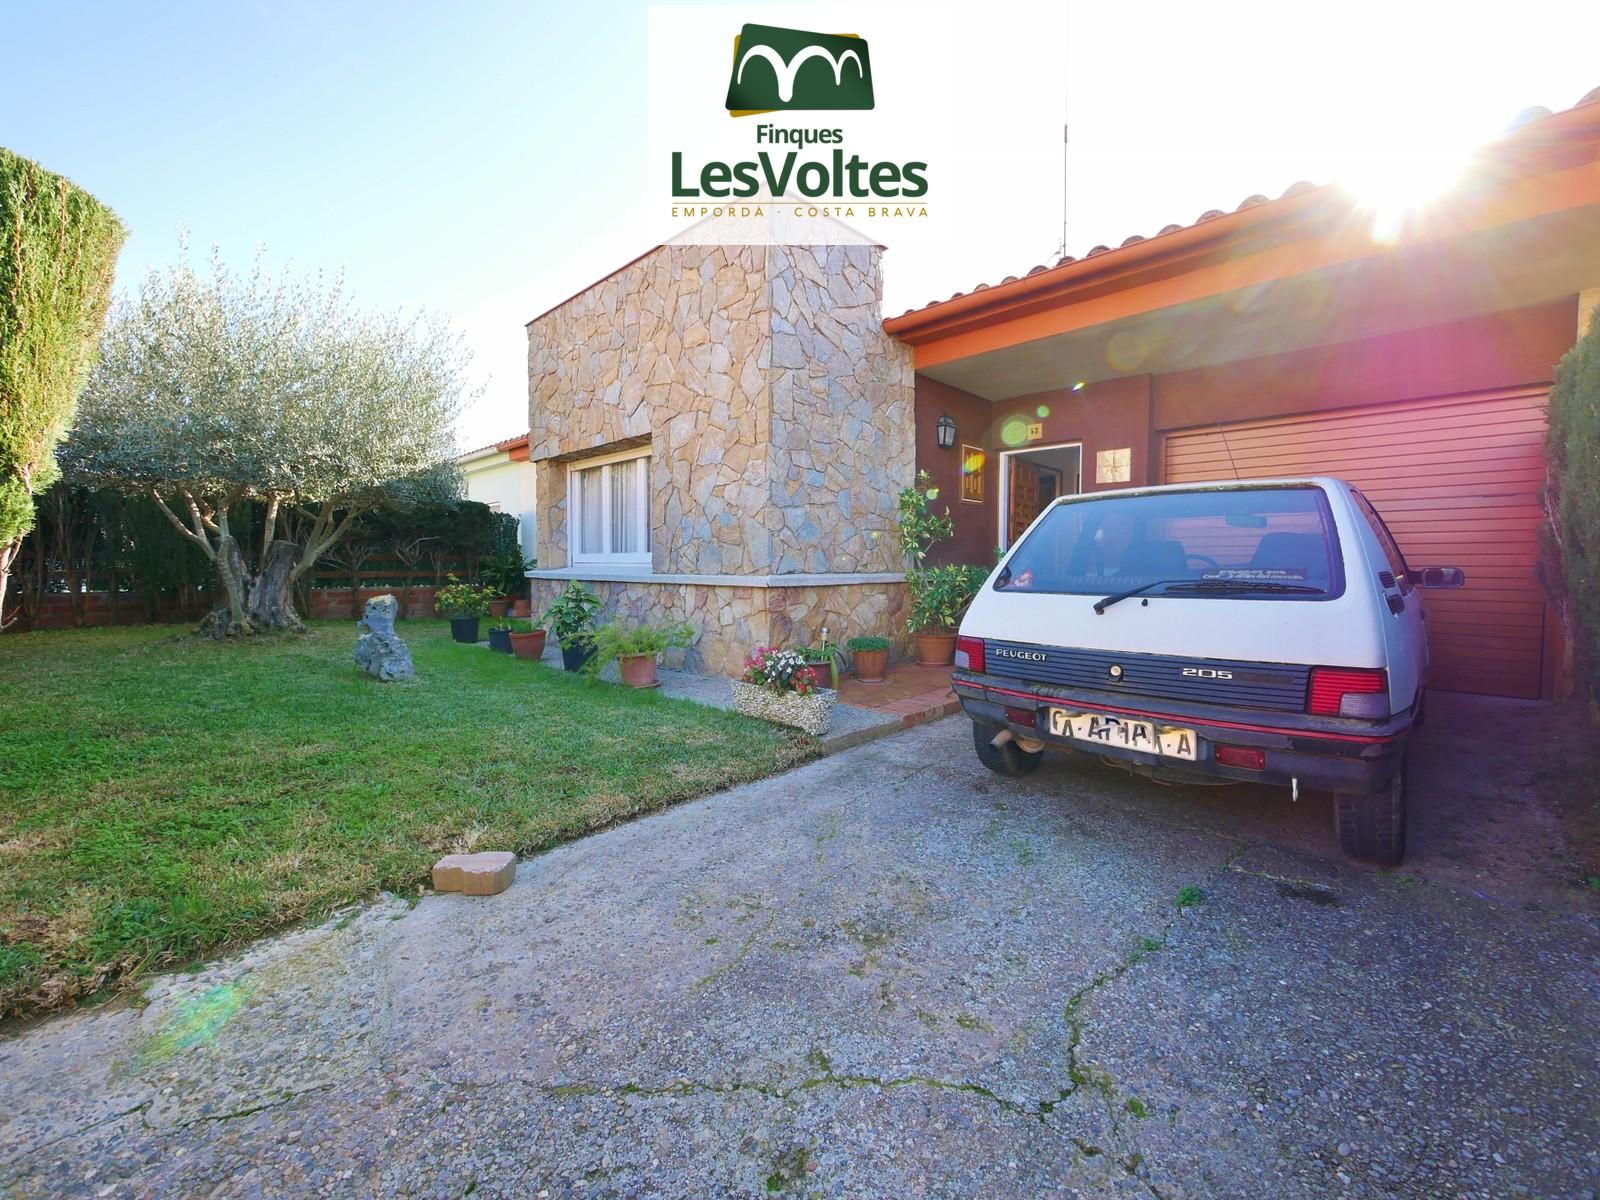 Casa unifamiliar amb jardí i garatge en venda a Palafrugell. Zona residencial tranquil·la.